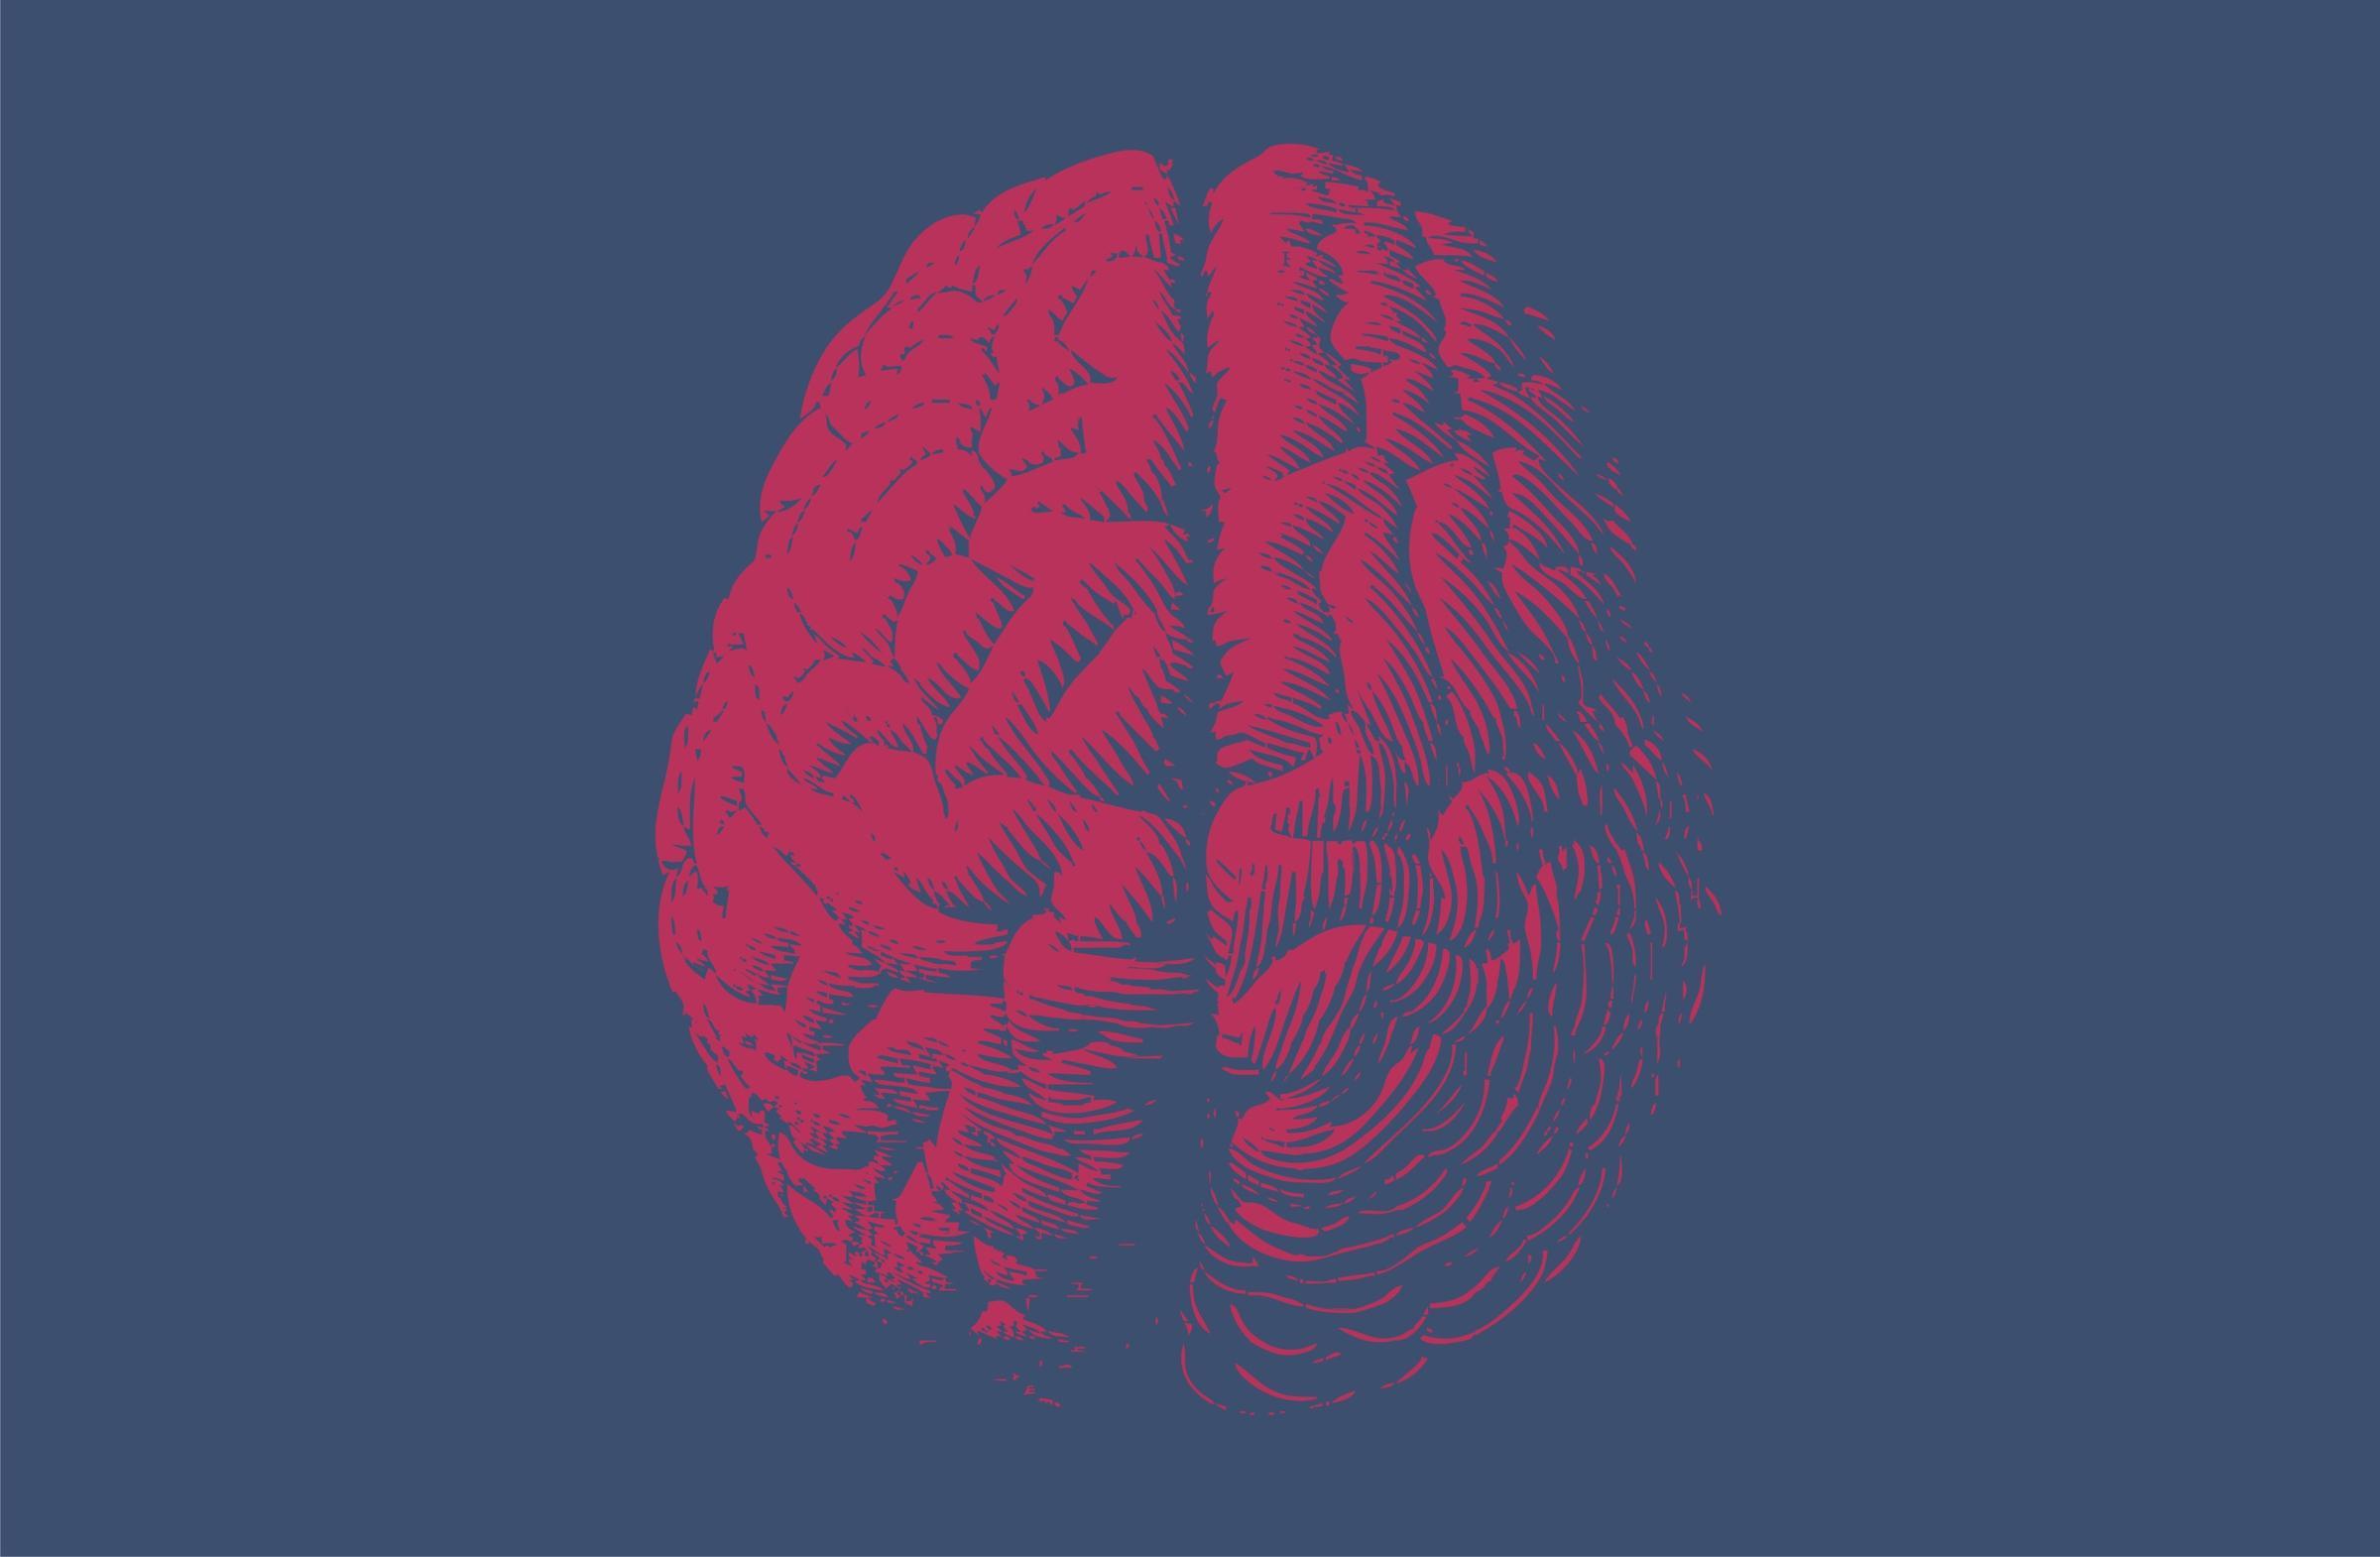 brain_mental_health_illustration_istock_jolygon_0.jpg